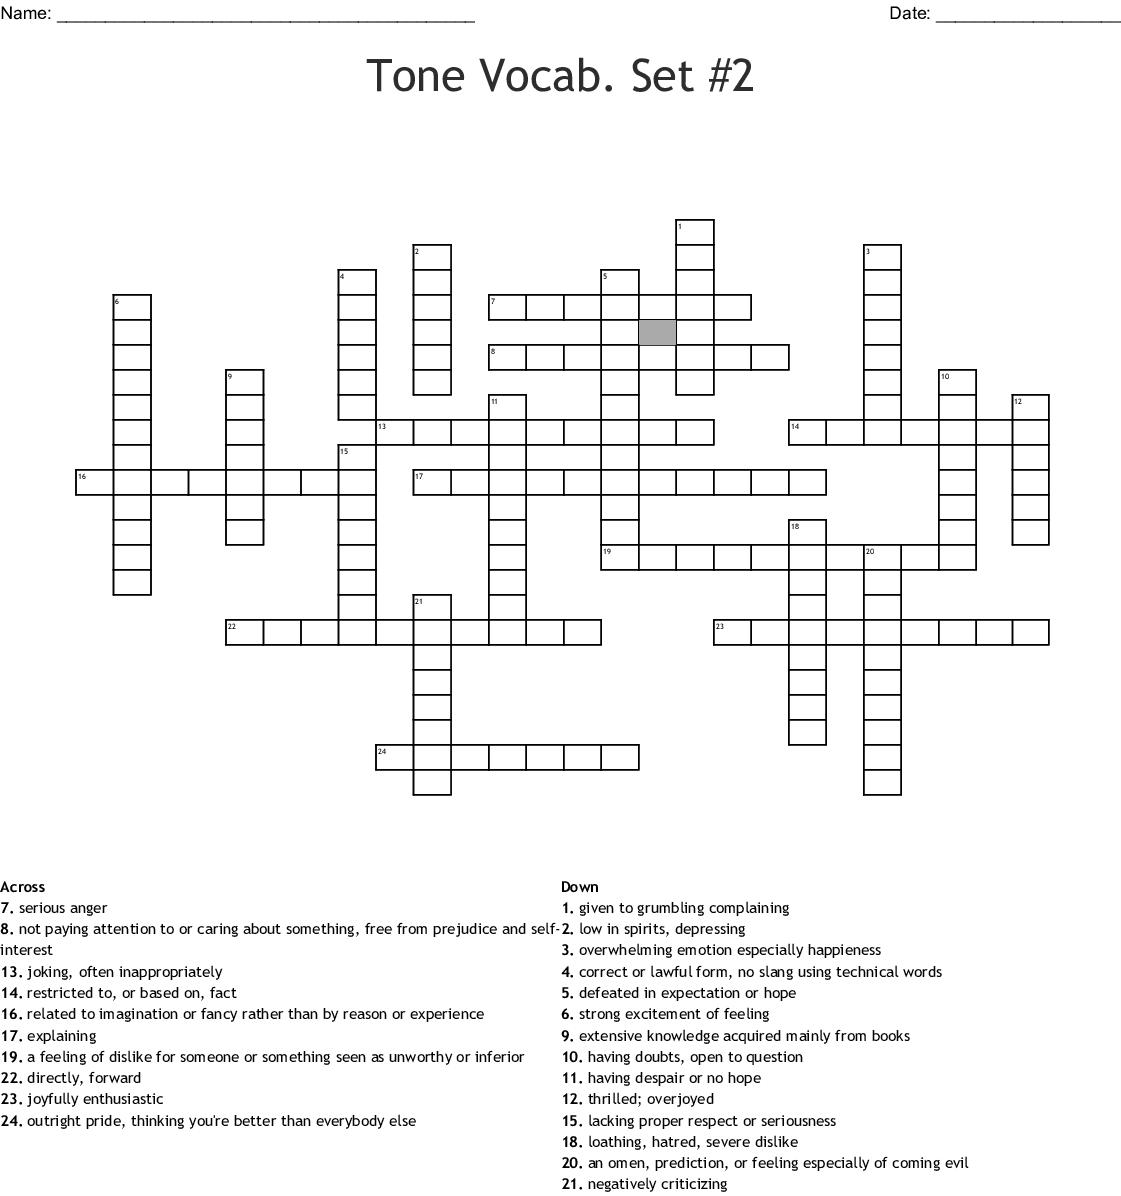 Tone And Mood Vocab Set 2 Crossword